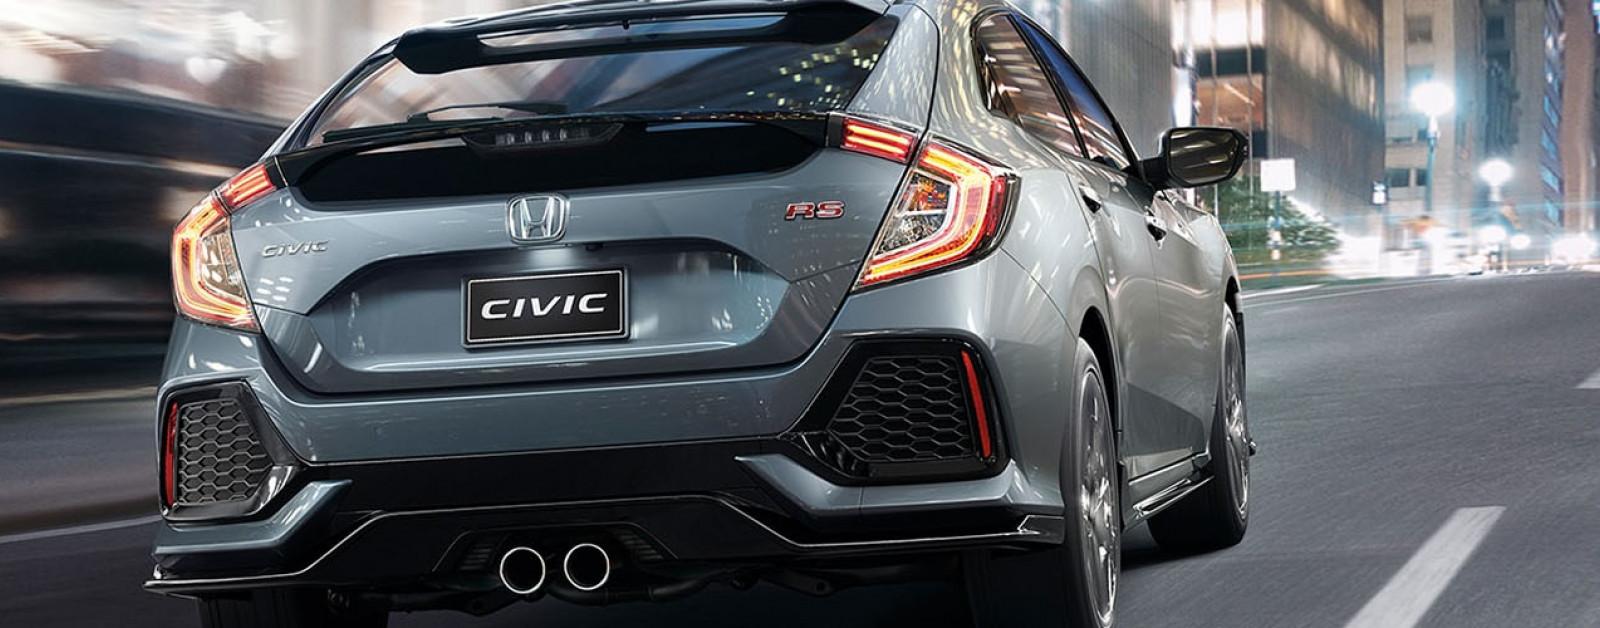 Civic Hatch